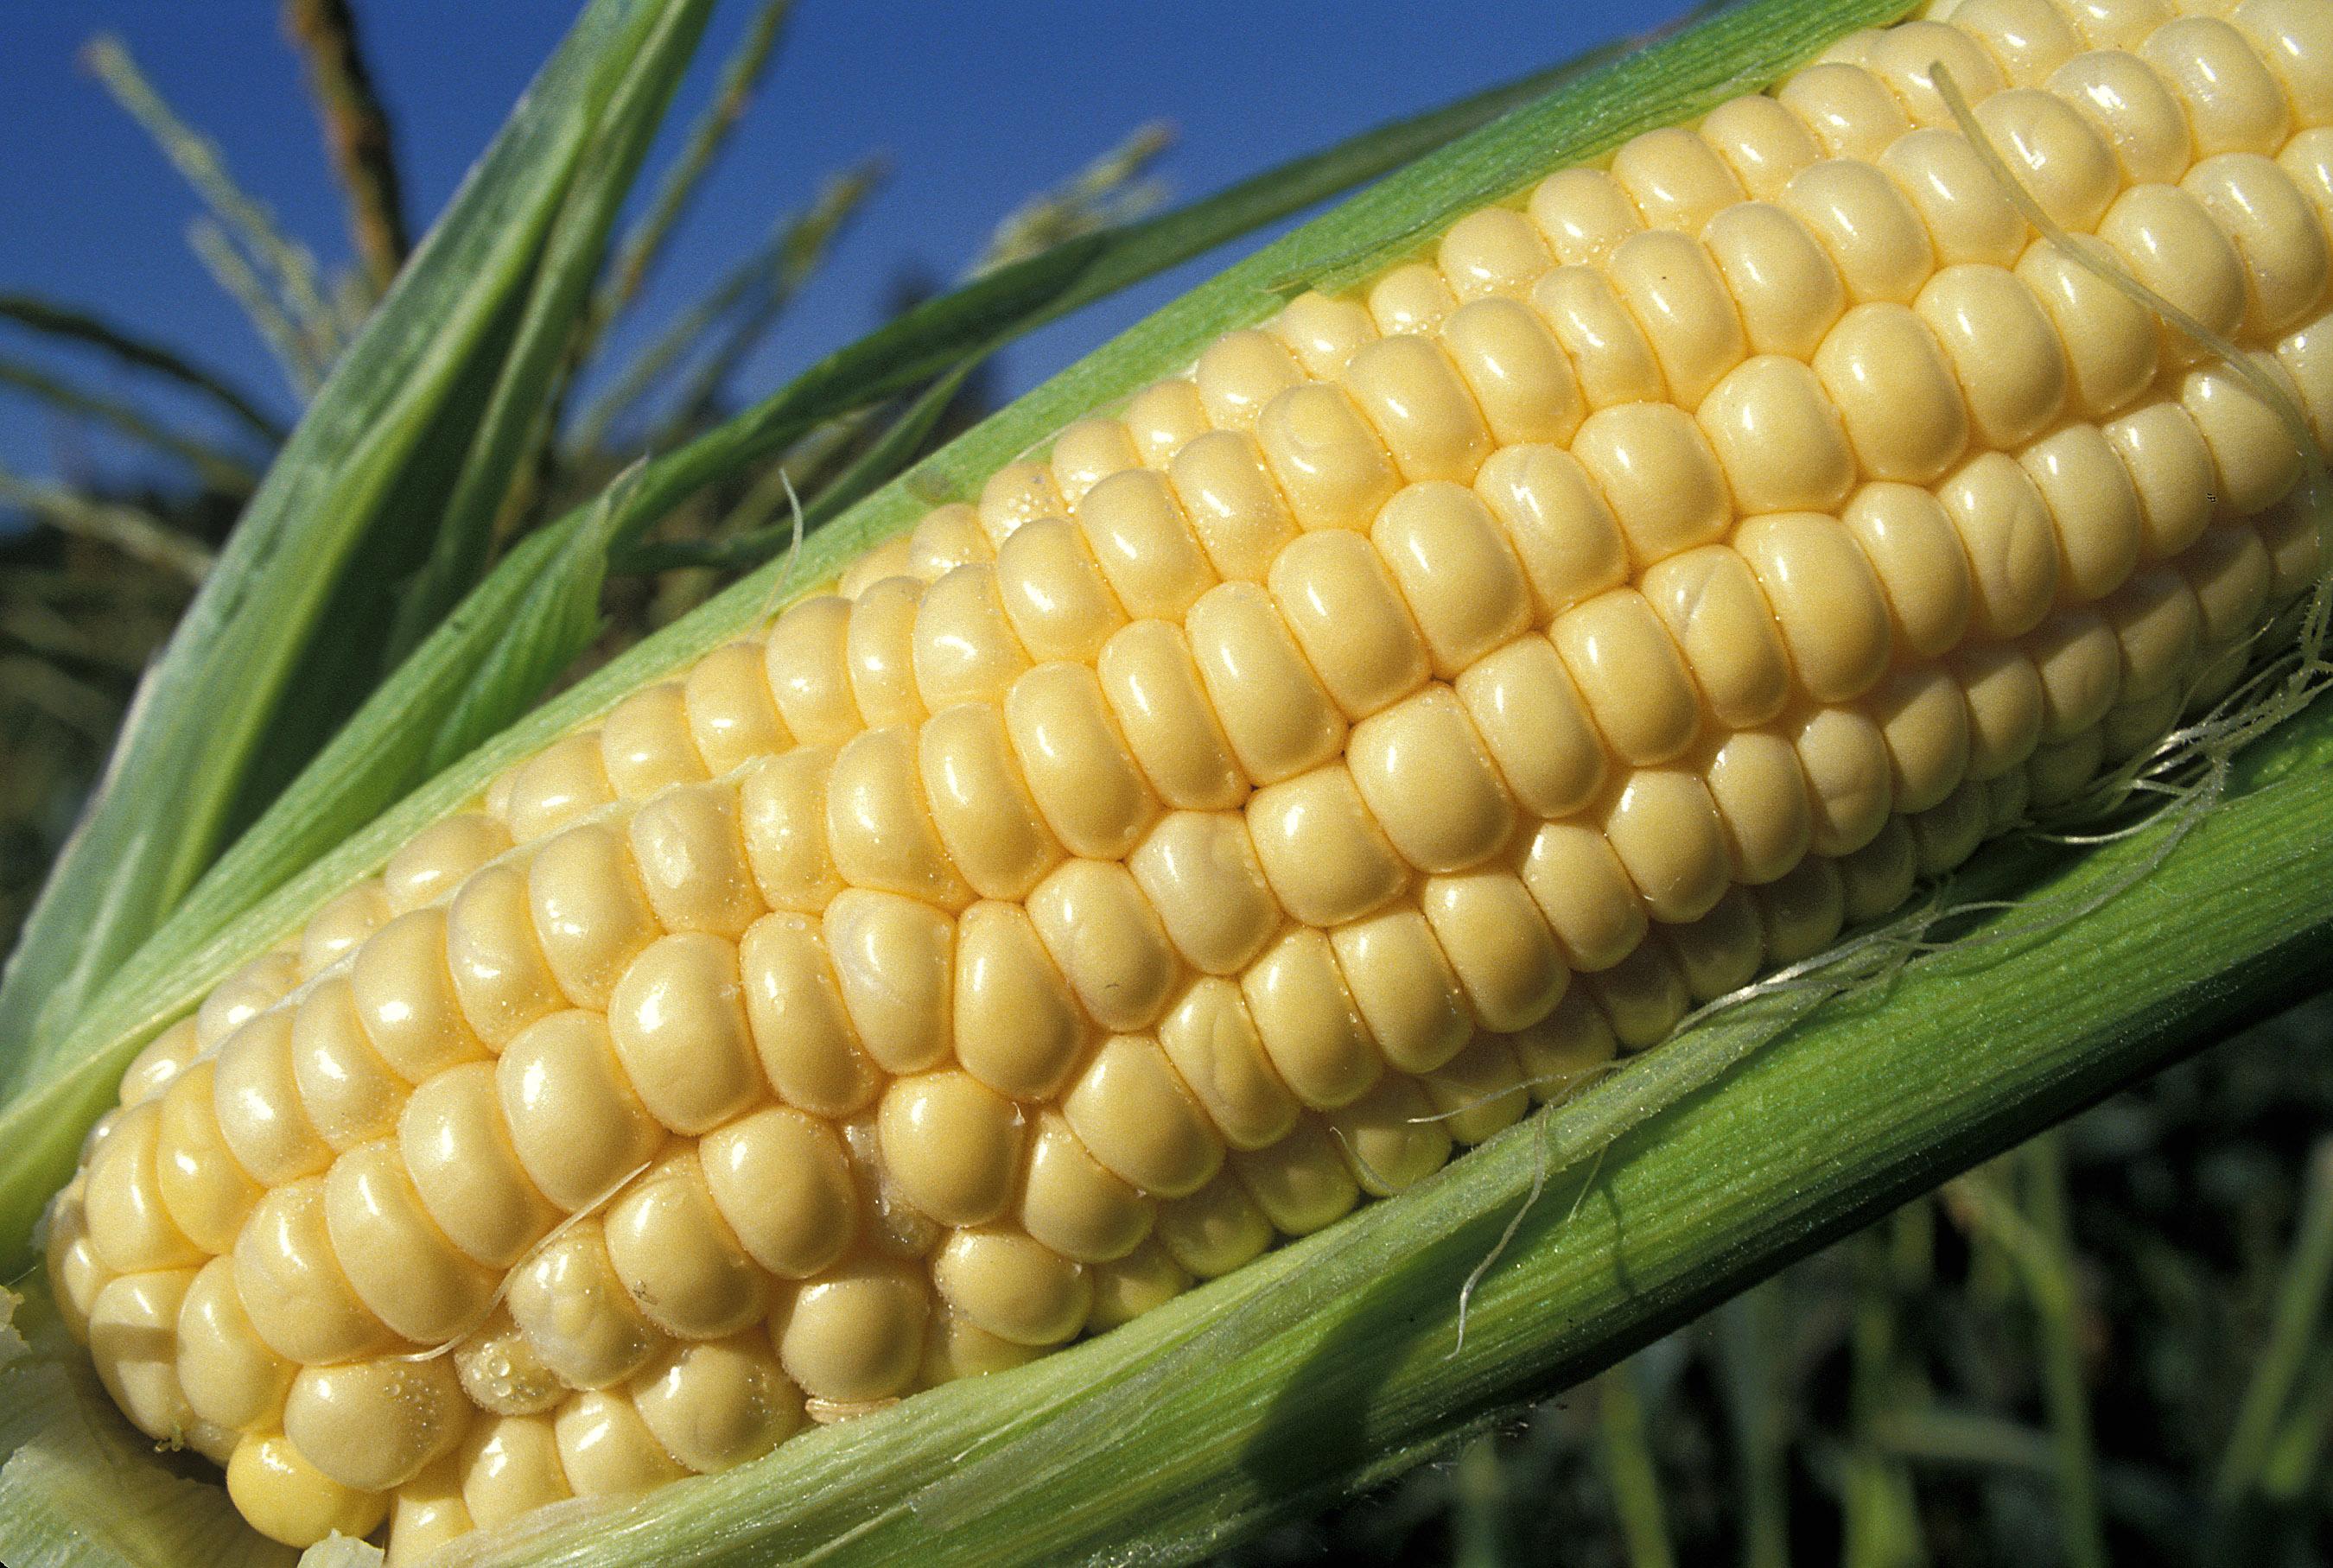 Monsanto: Bayer's Acquisition Will Fail (And Monsanto Will Receive $2 Billion) - Monsanto Company (NYSE:MON)   Seeking Alpha